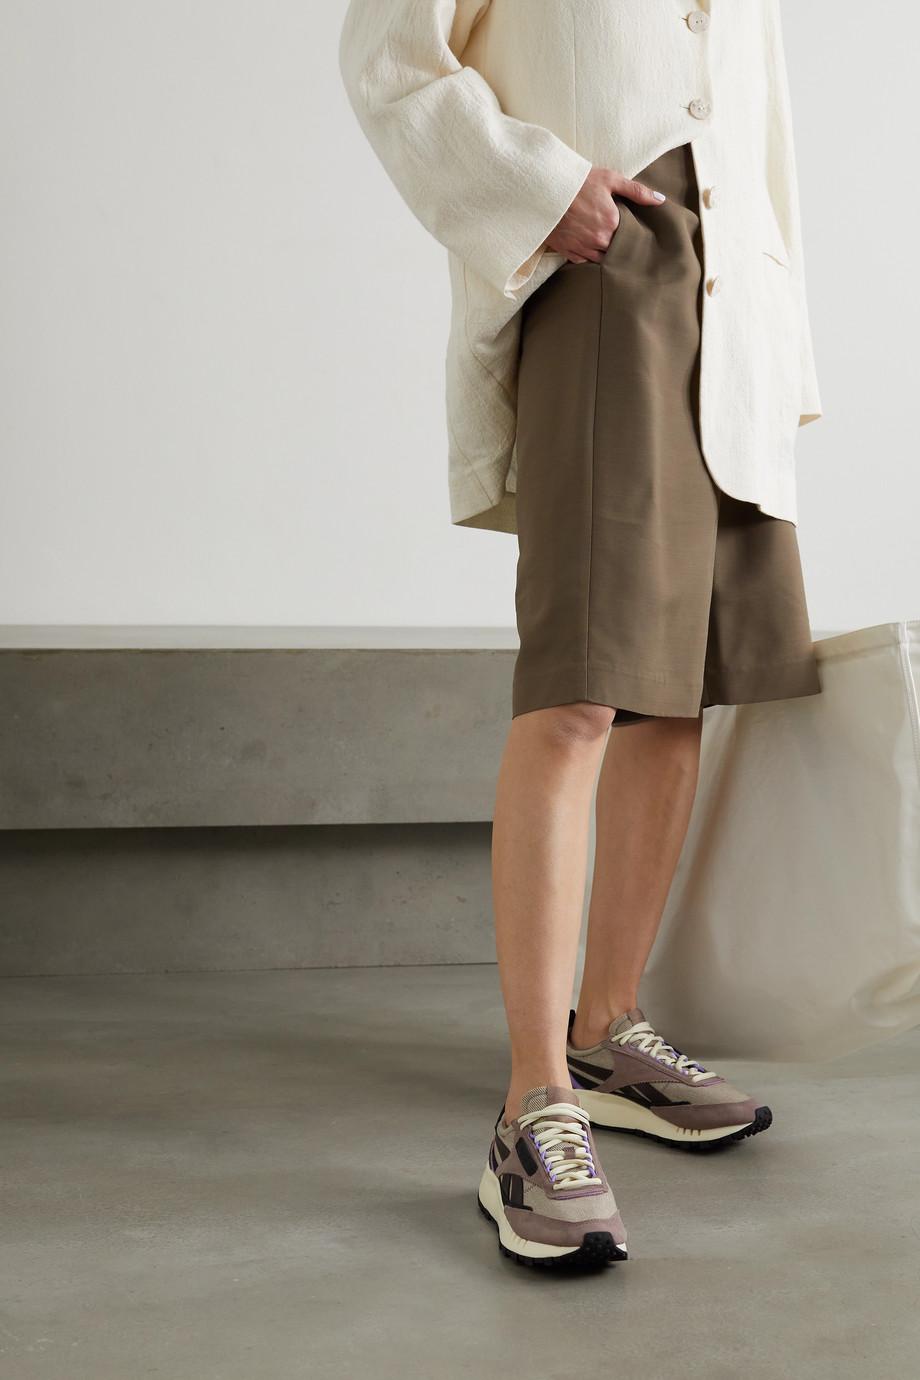 Reebok Baskets en daim, cuir et serge Classic Leather Legacy x A$AP Nast